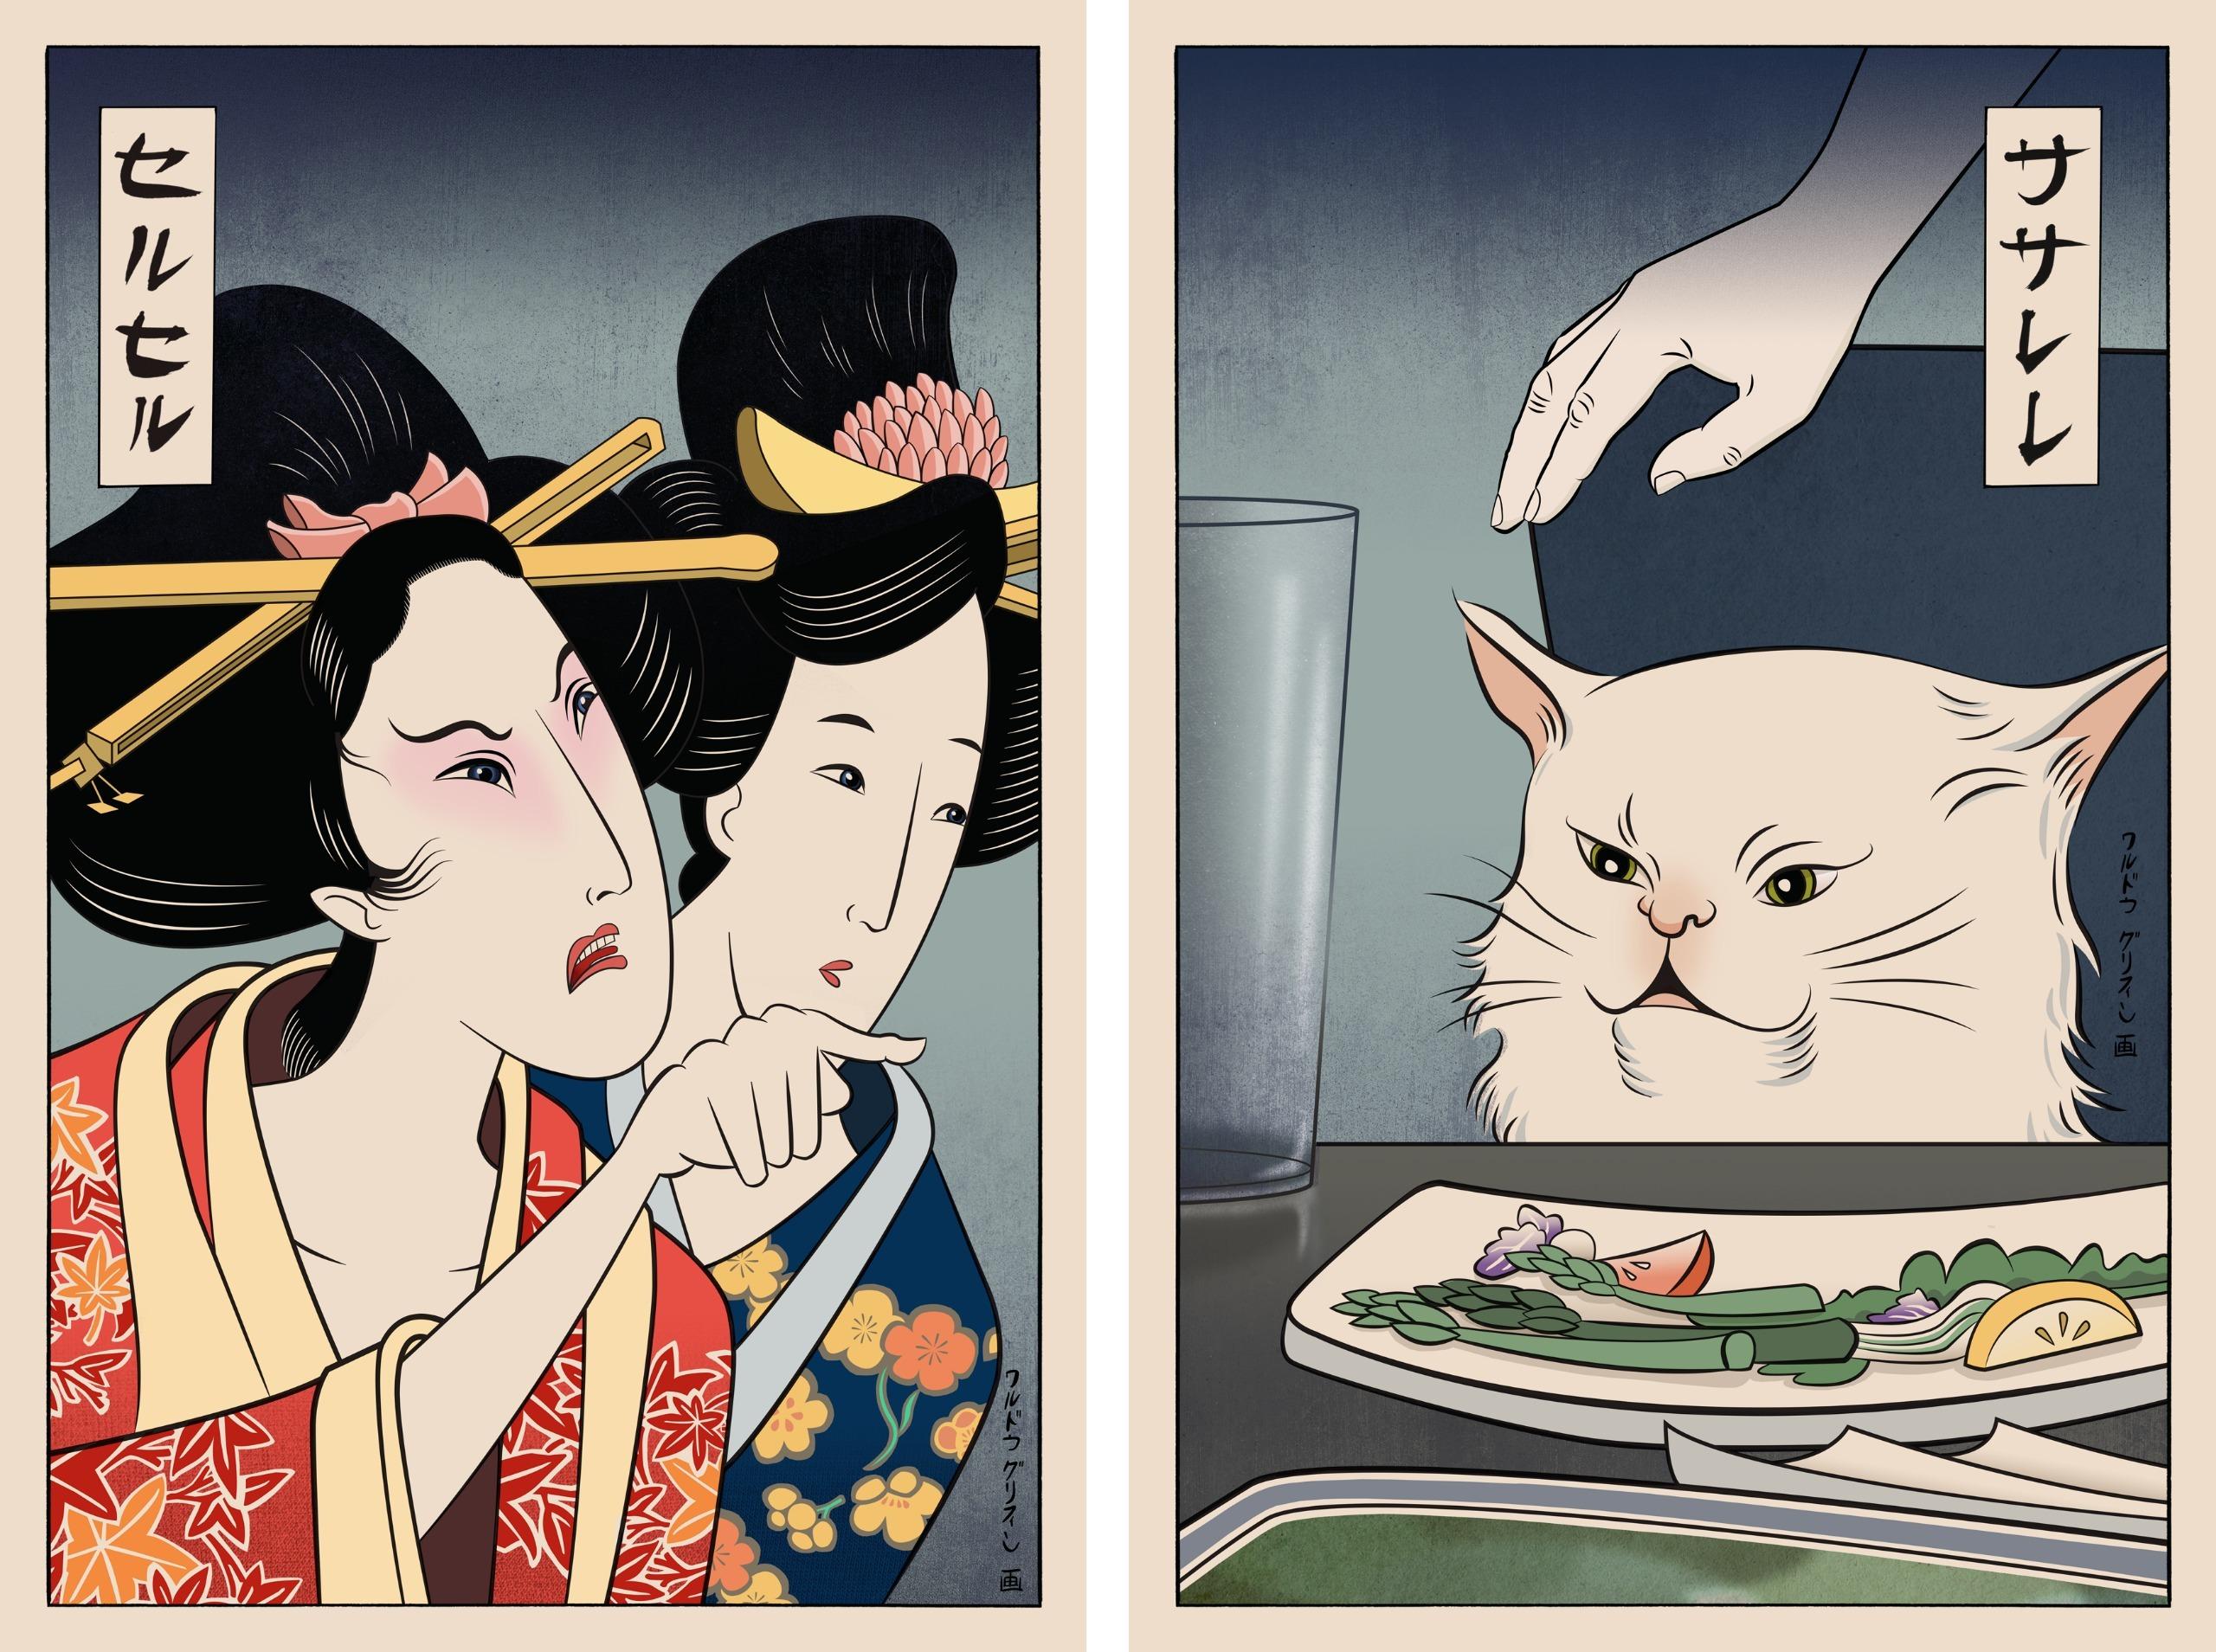 Woman Yelling Cat Meme - style - griffinisland | ello